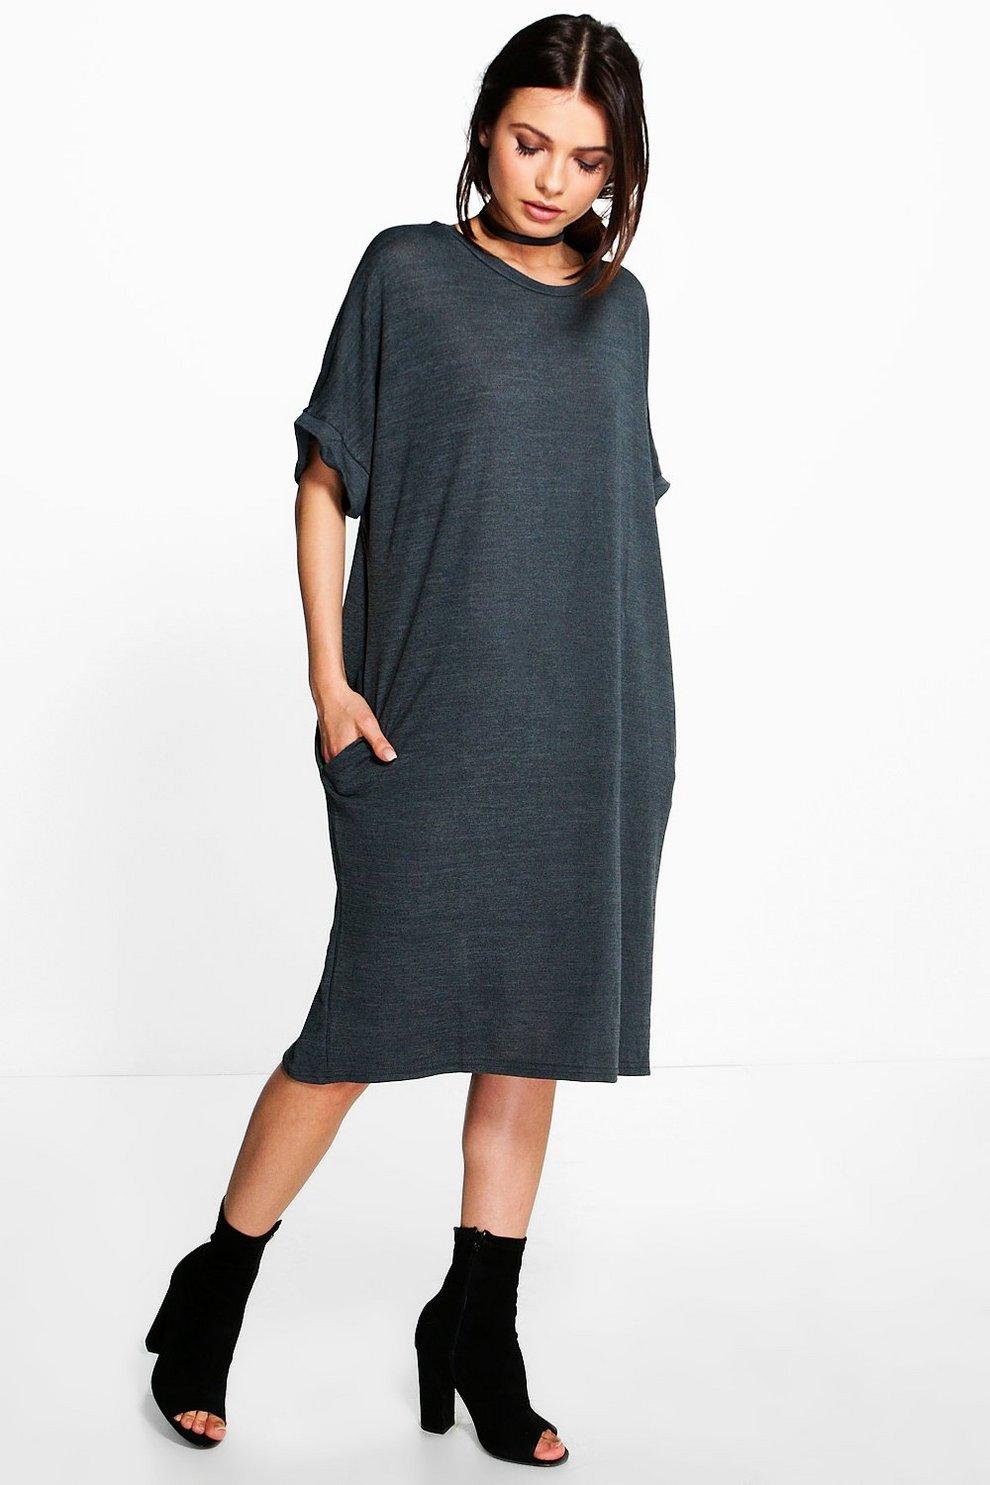 de6994e345ee Poppy Oversized Knitted Dress